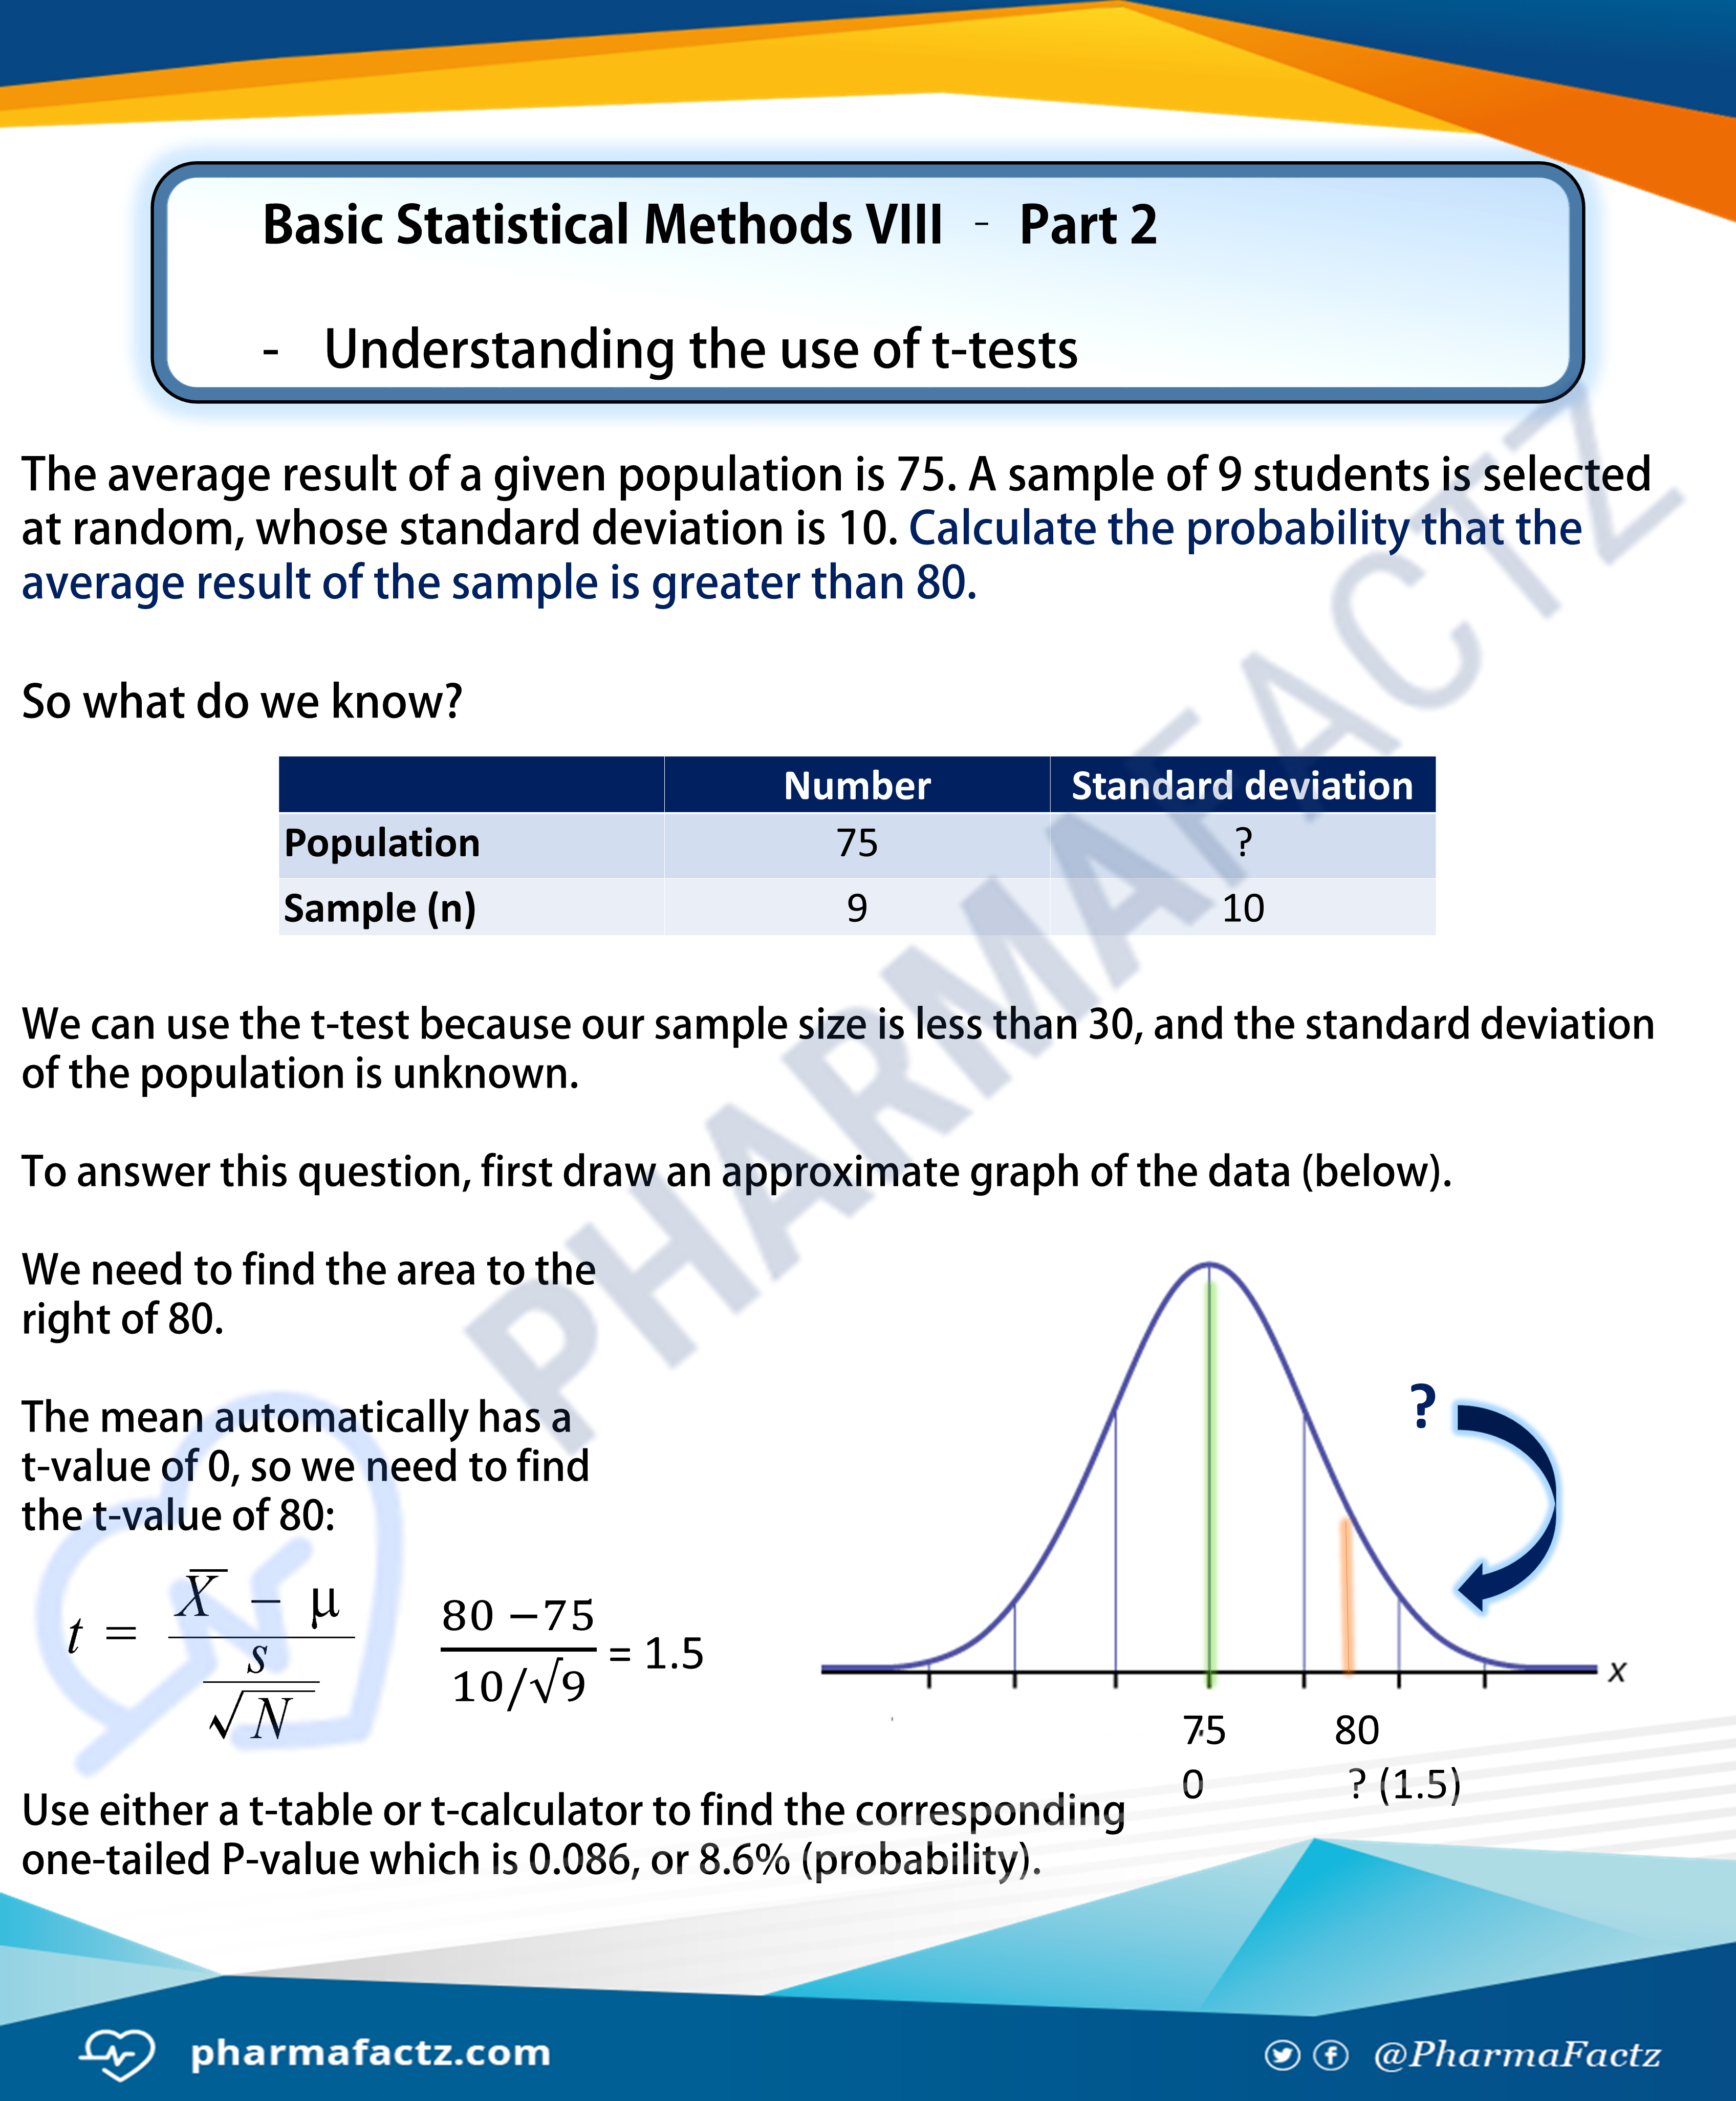 Basic Statistical Methods 8 (Part 2)